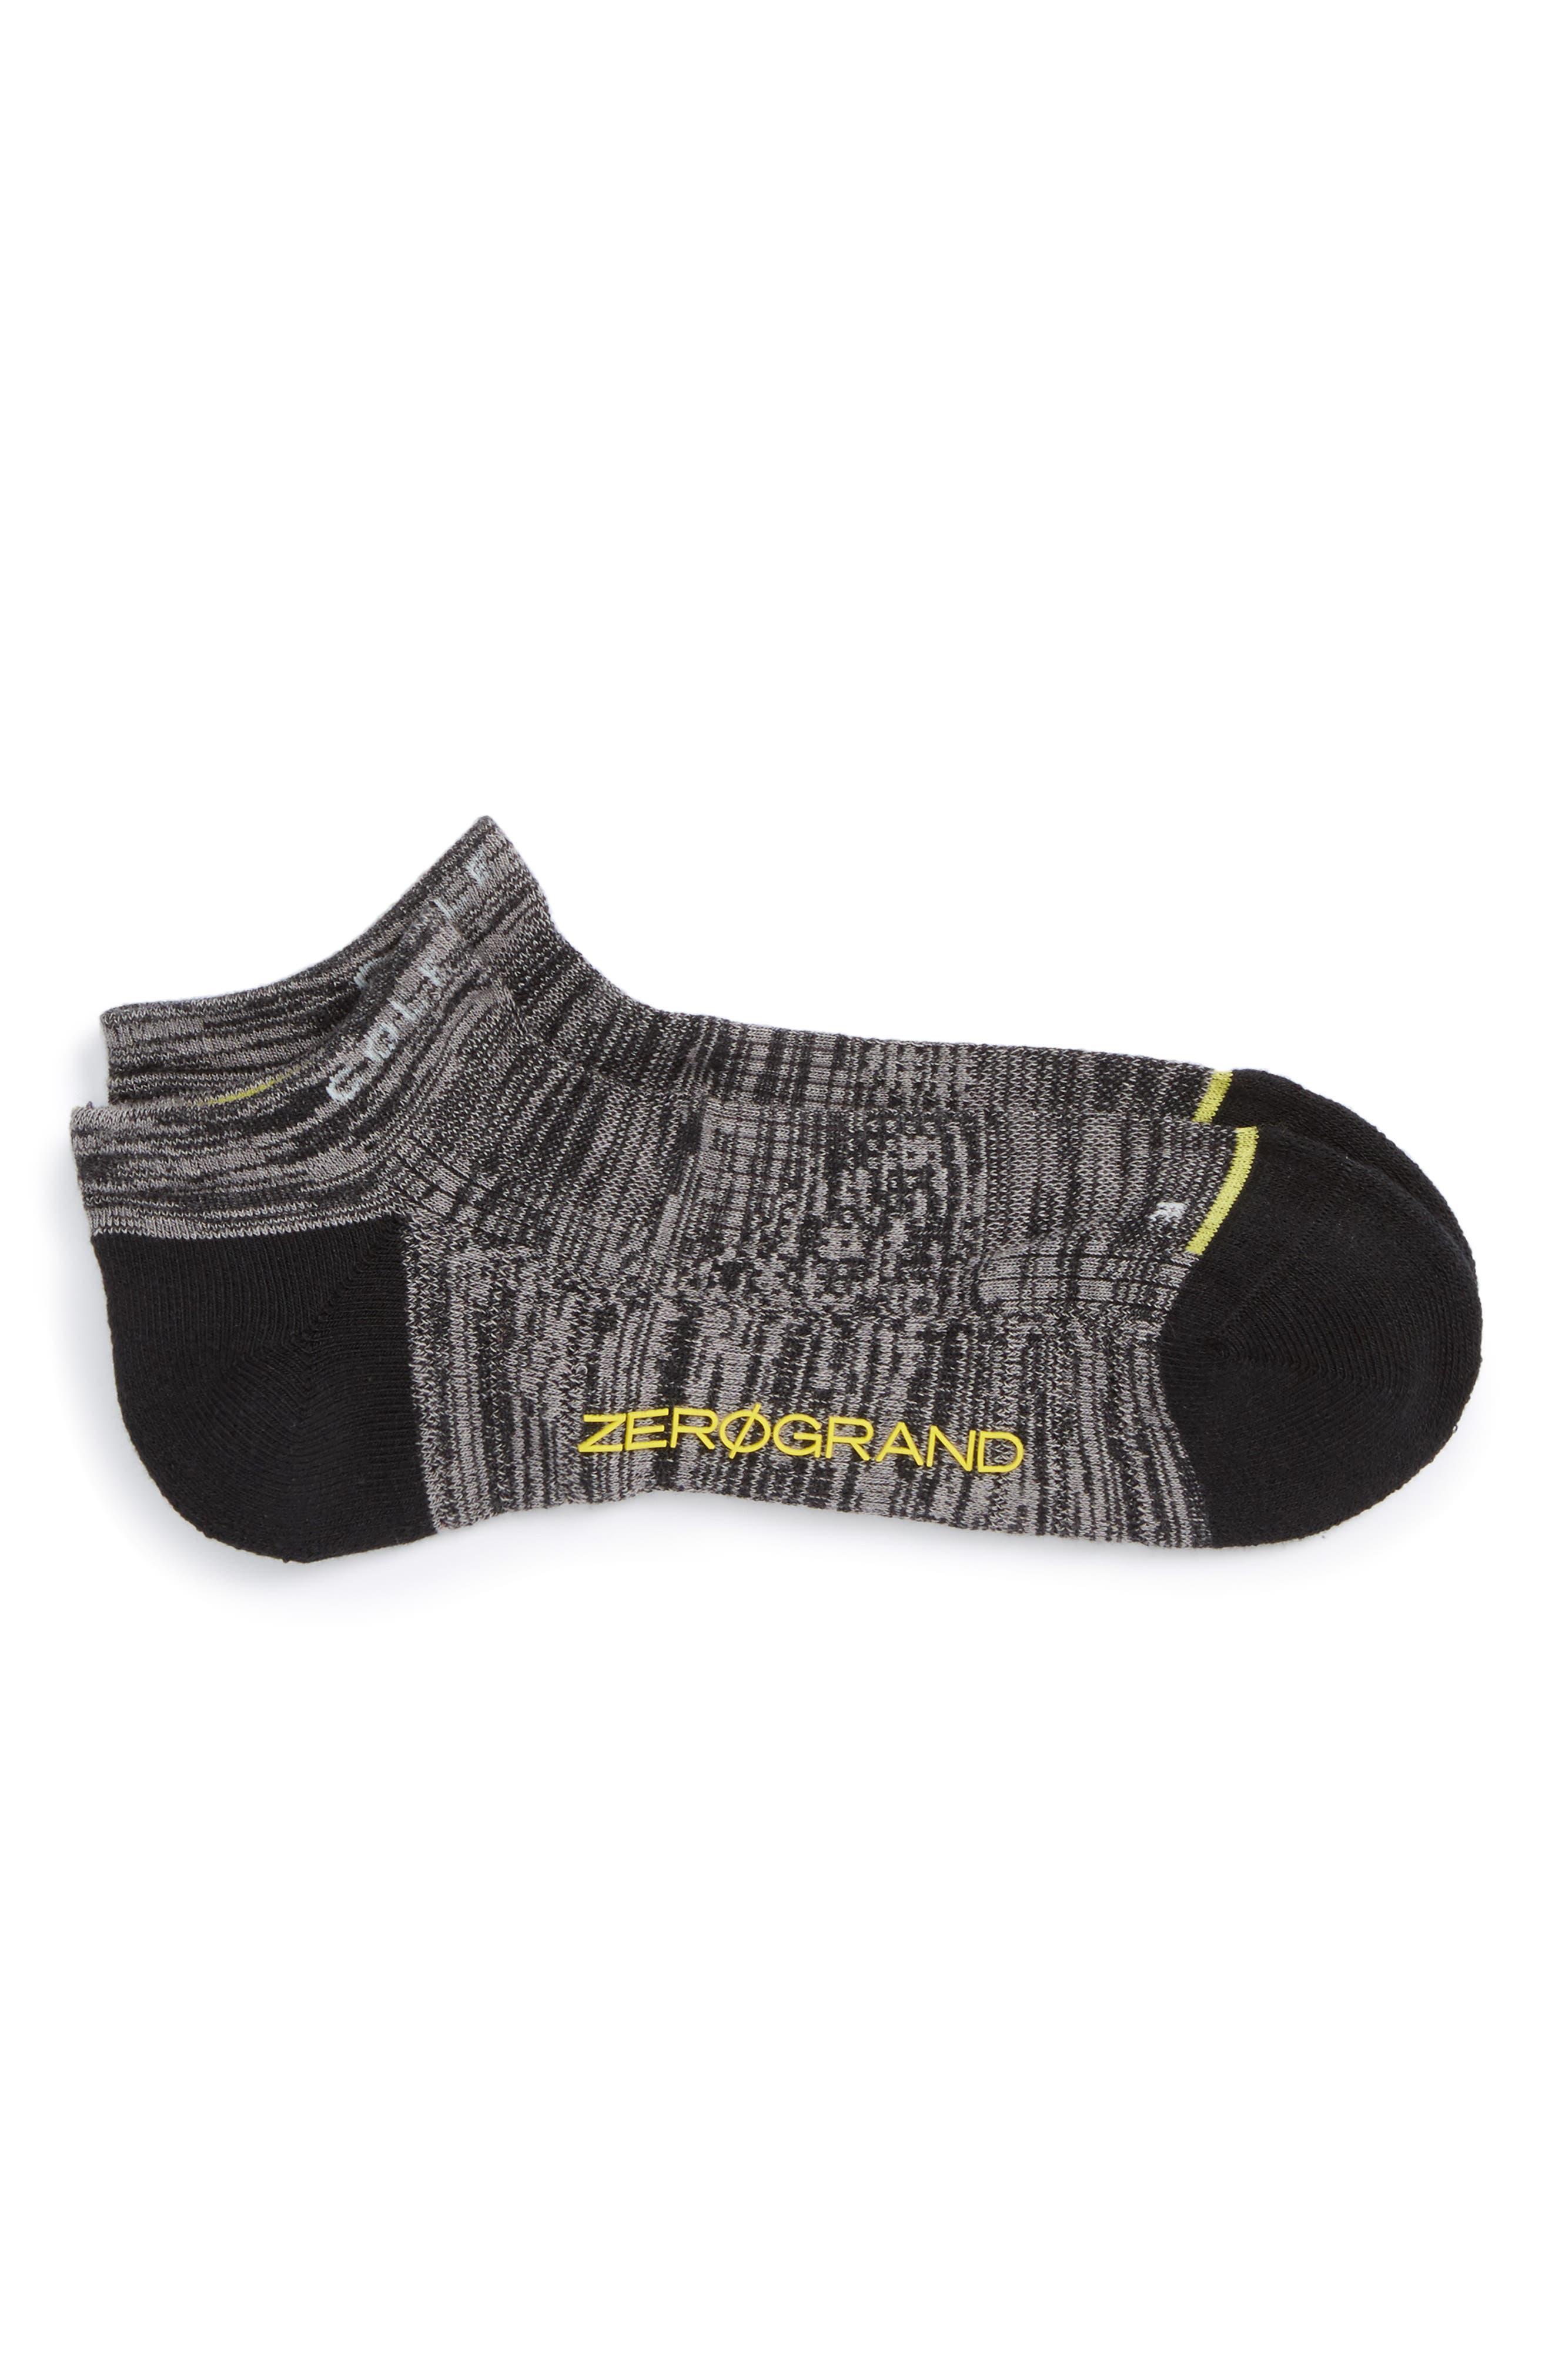 ZeroGrand Liner Socks,                         Main,                         color, Black